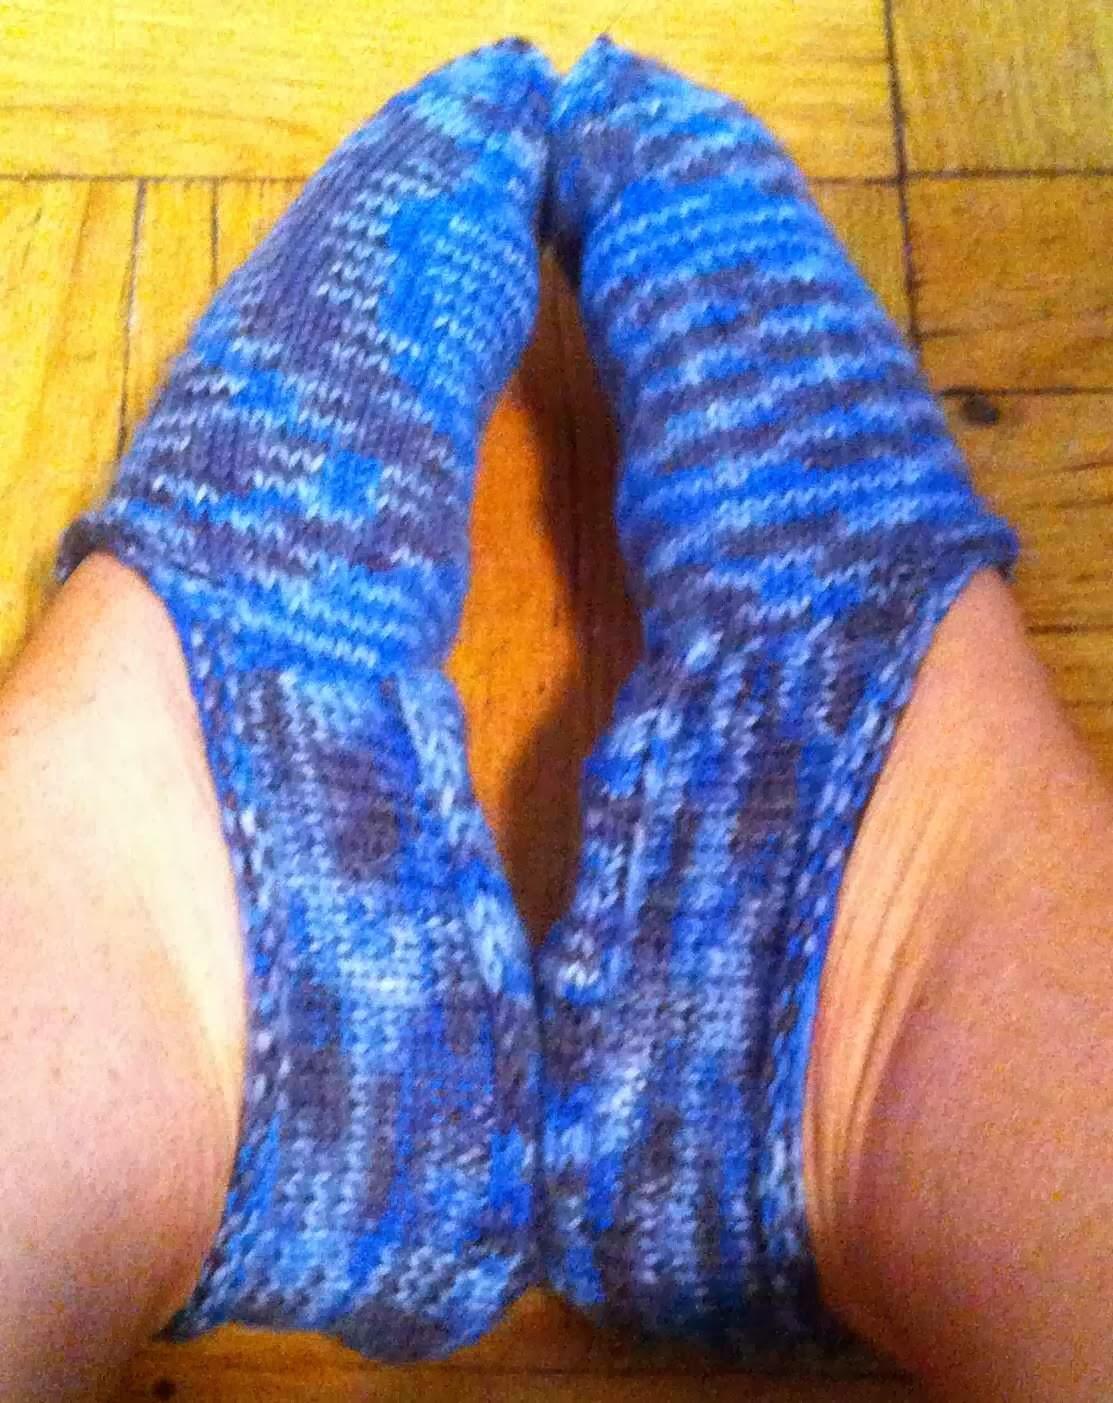 Free Knitting Pattern Bed Socks : Backward Knitter: Turkish Bed Socks